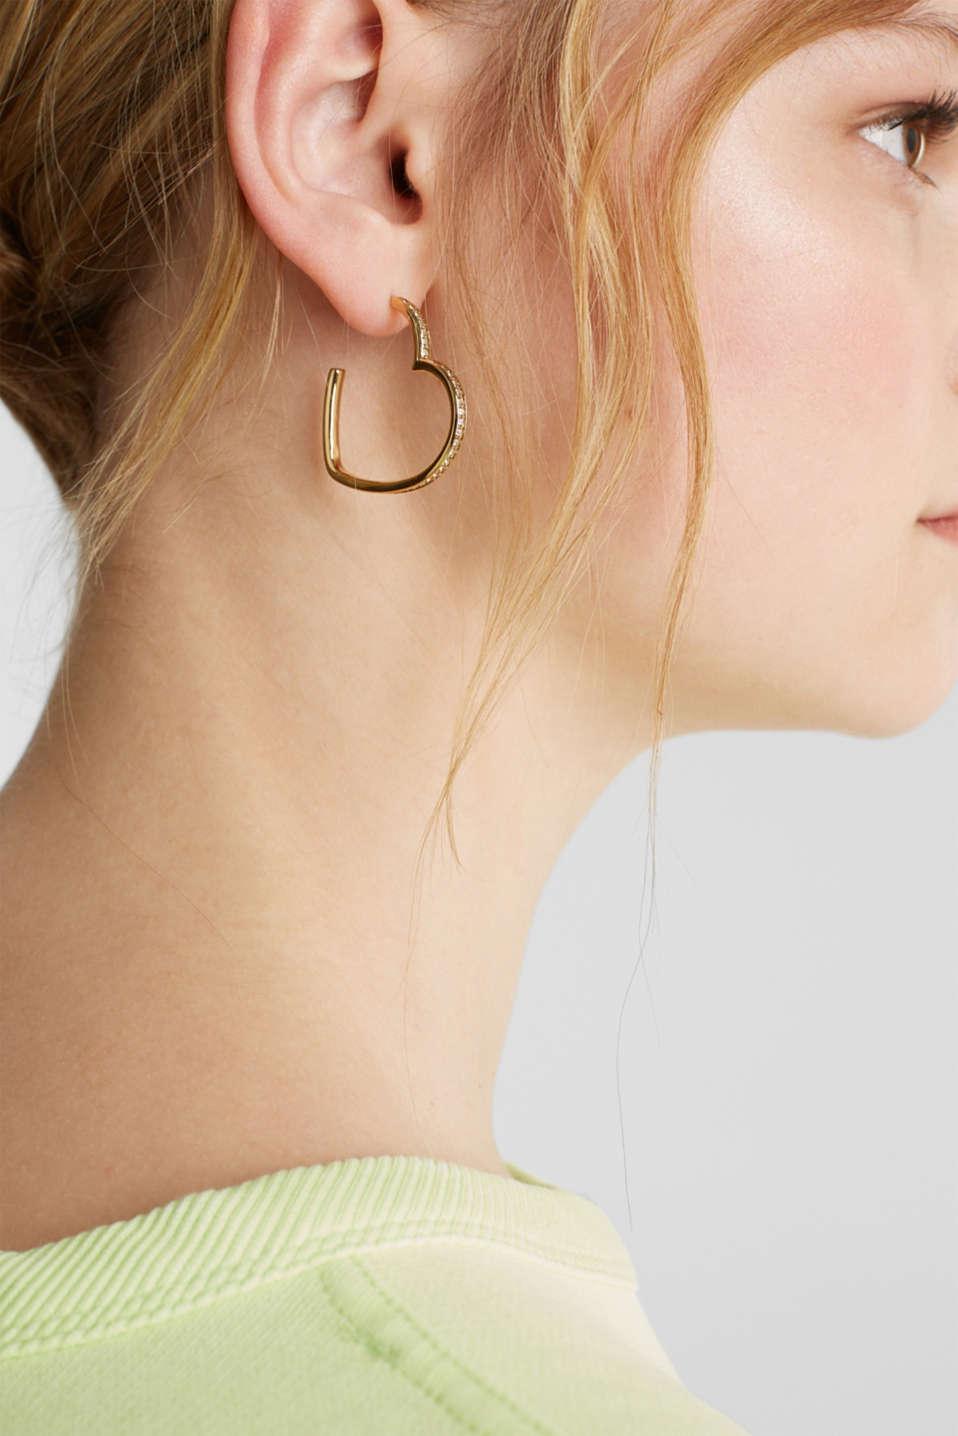 Stainless steel heart hoop earrings, LCGOLD, detail image number 2